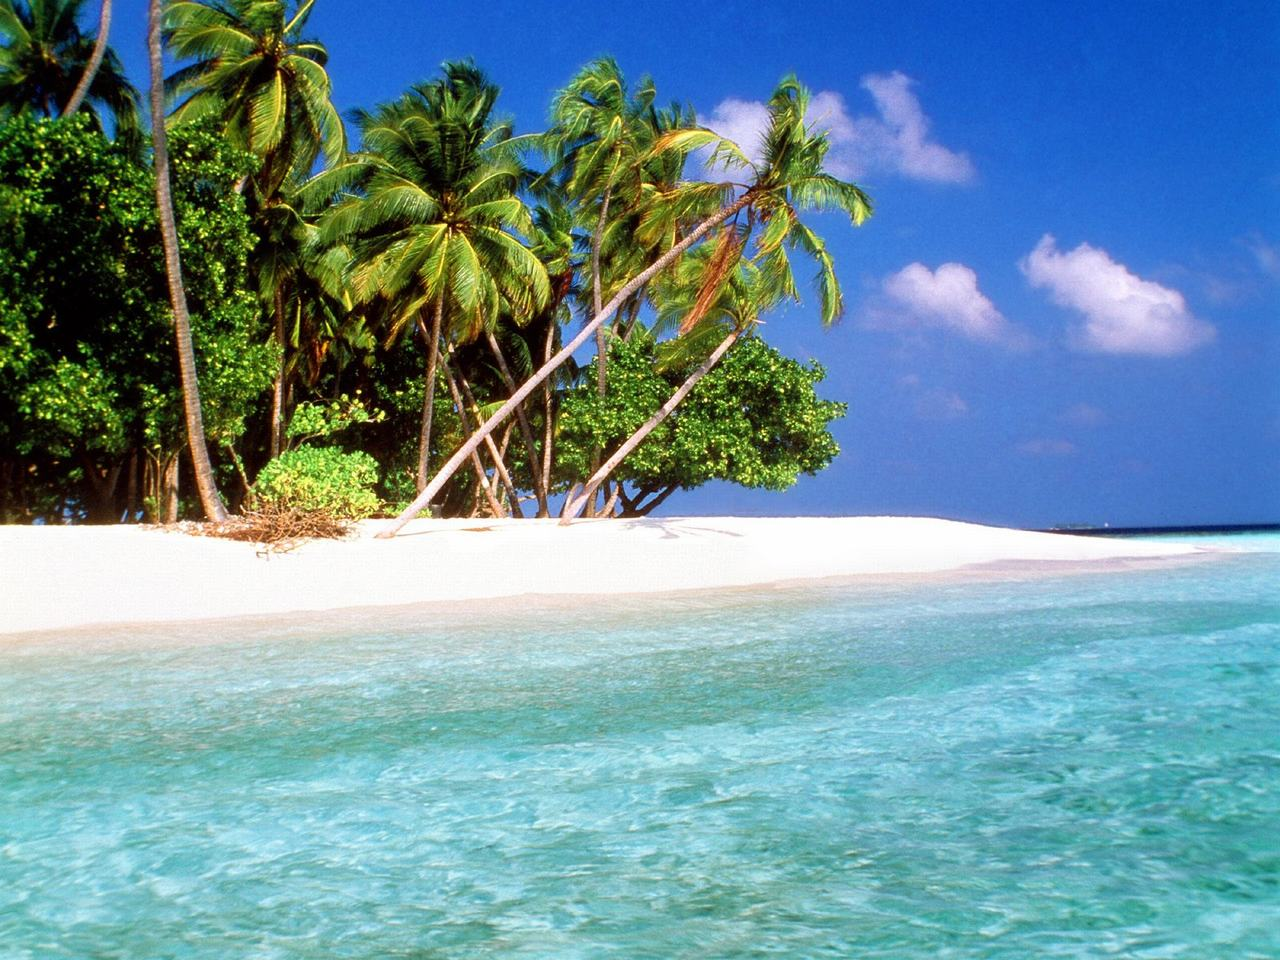 Beach Scenery Wallpaper 1280x960 59906